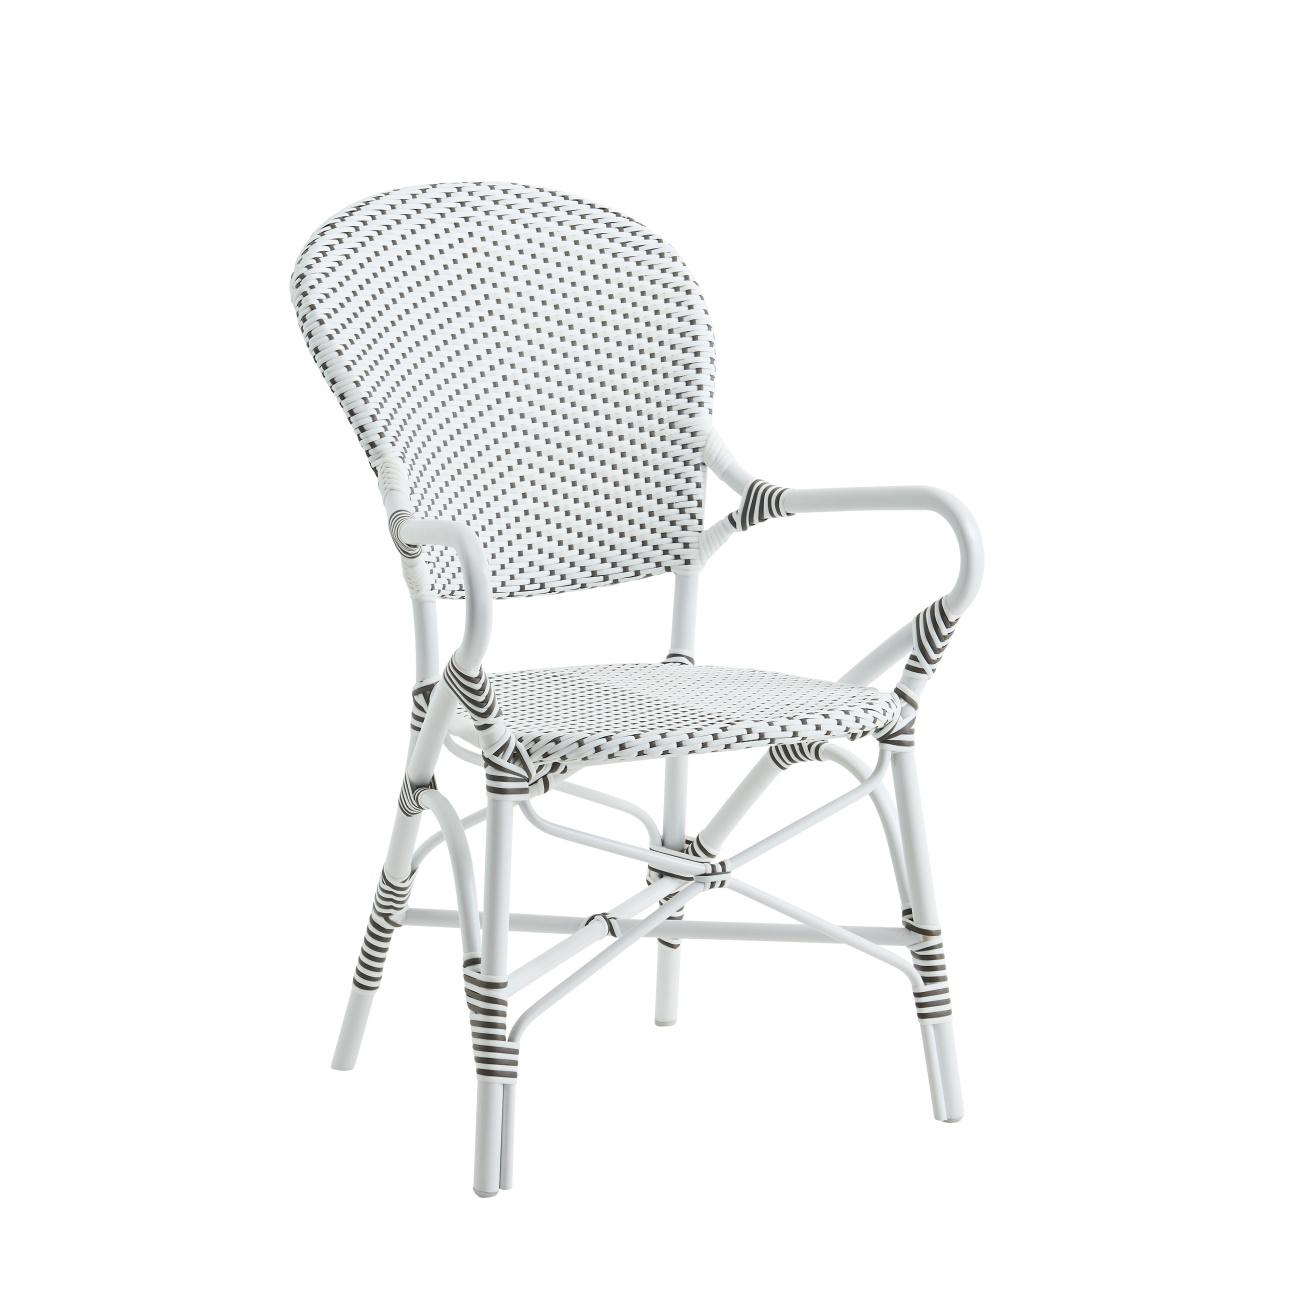 Isabell Alu arm stol vit, Sika Design